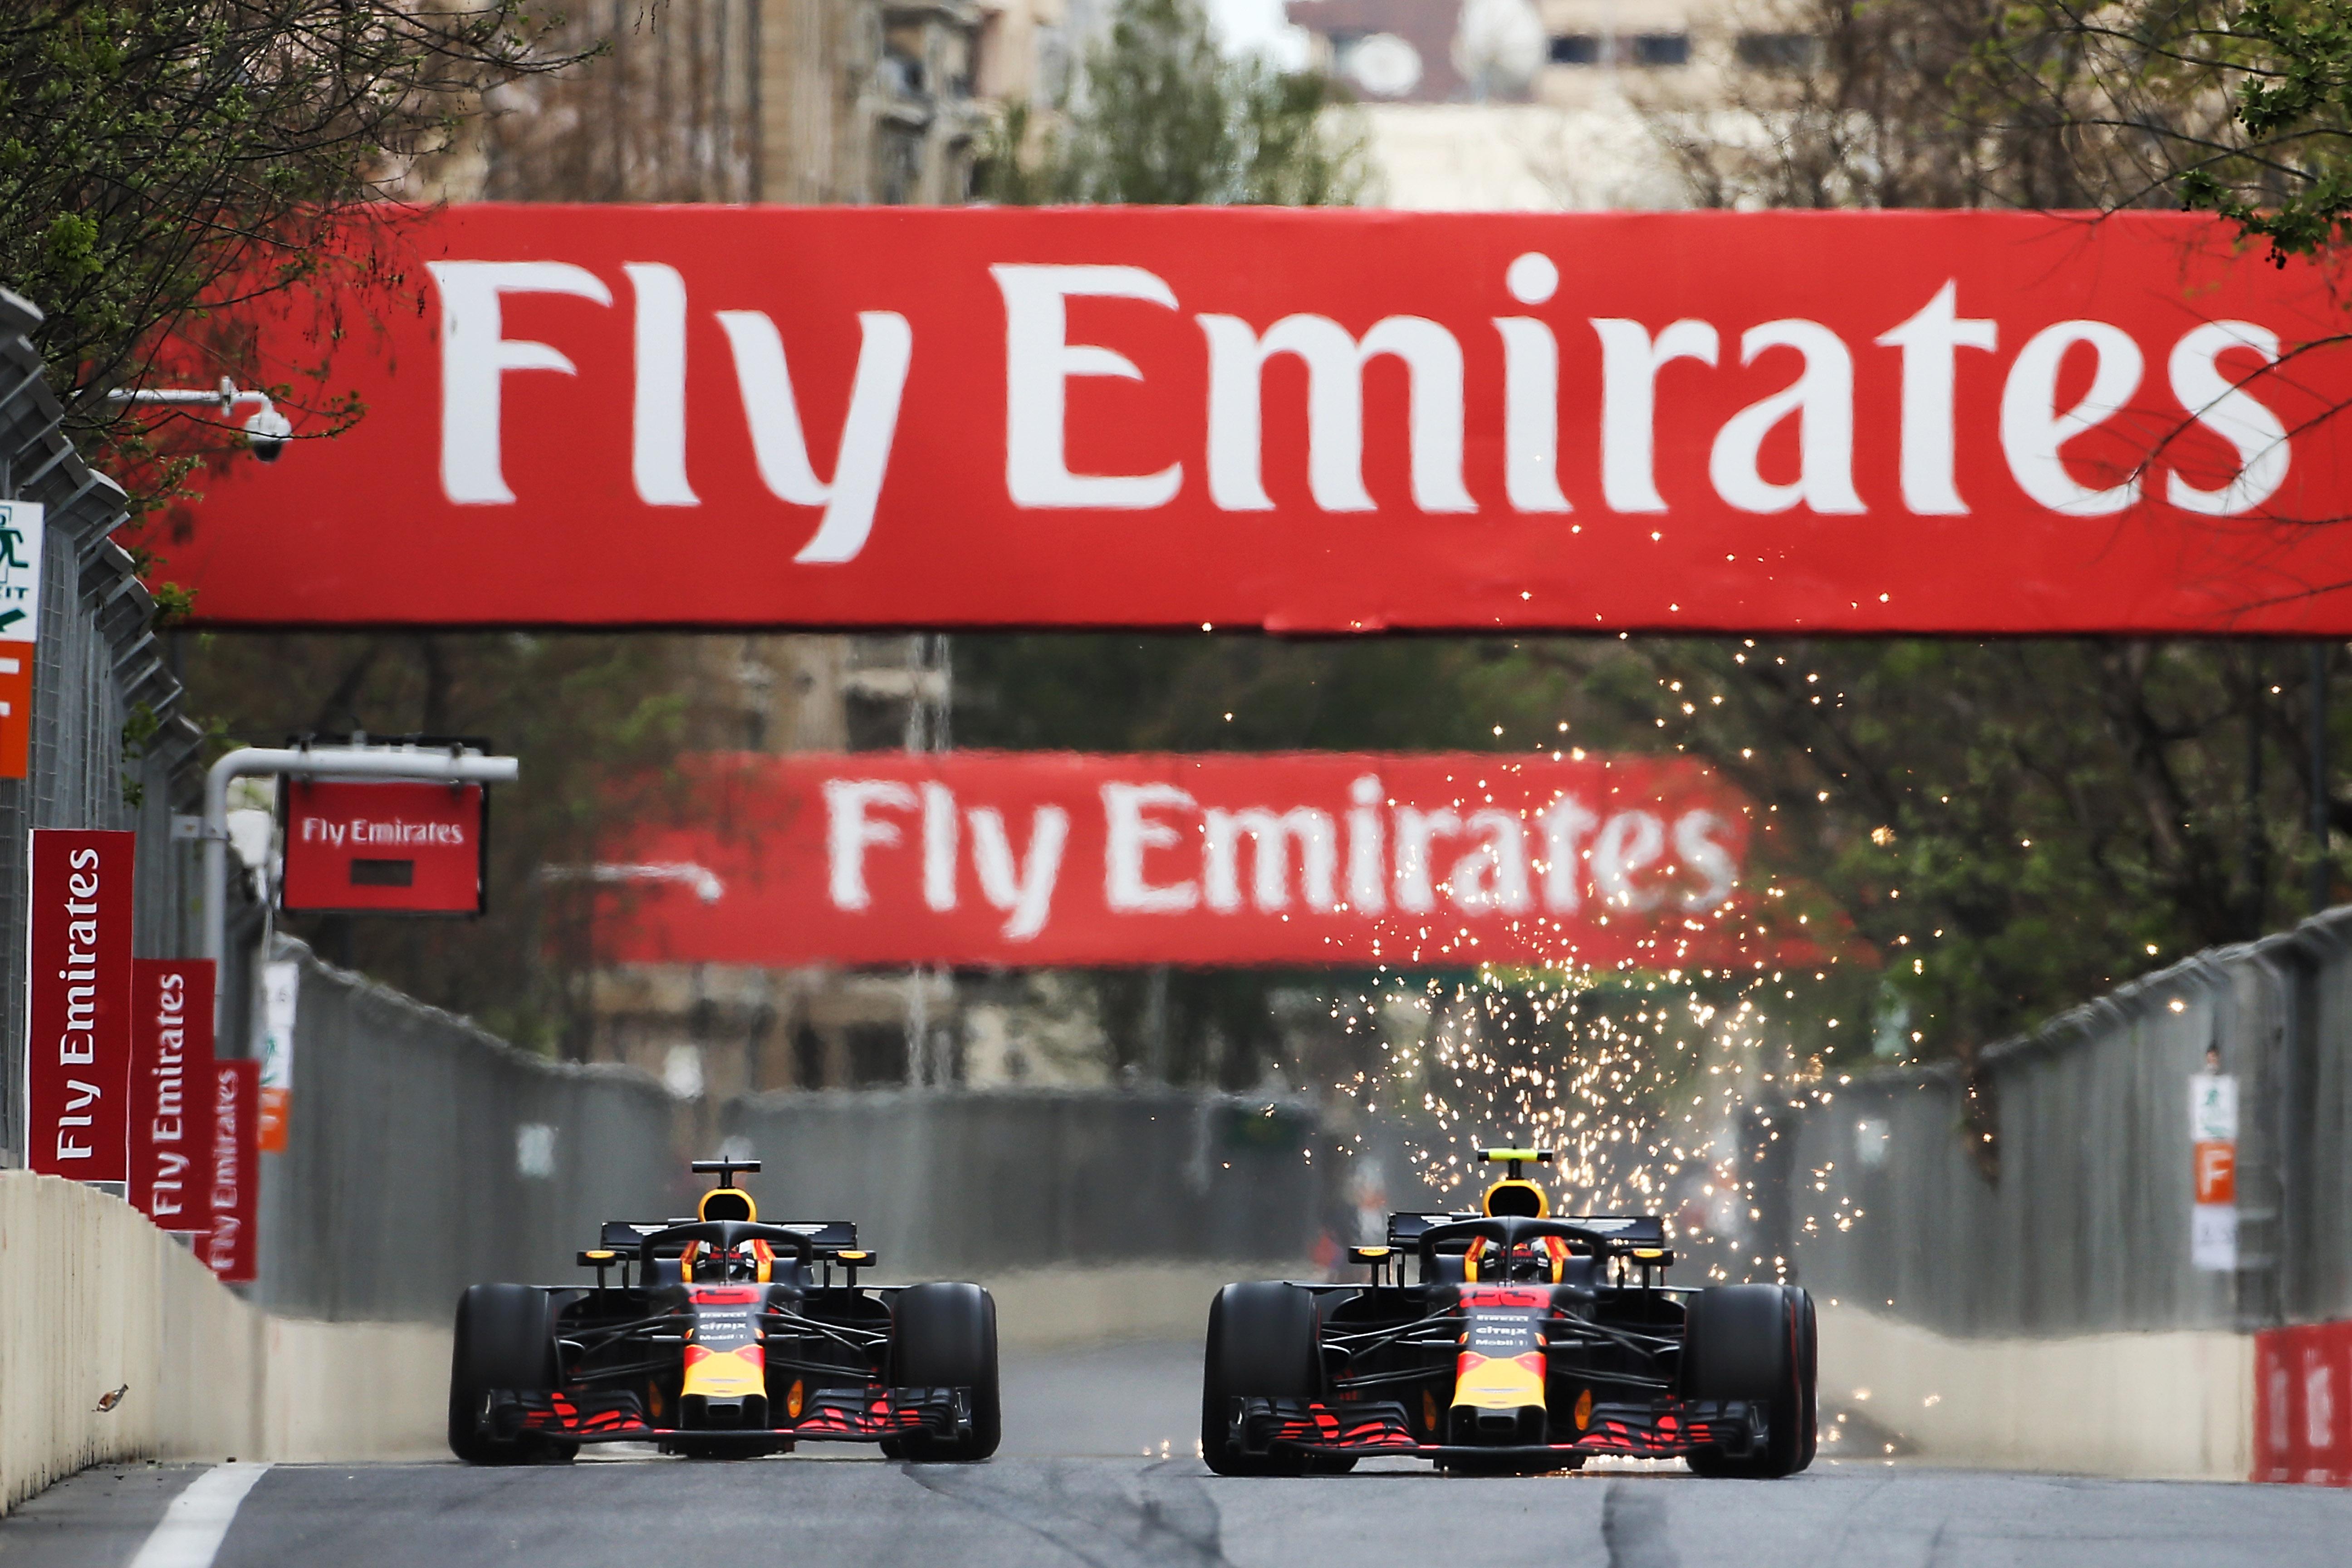 Max Verstappen Daniel Ricciardo Red Bull Azerbaijan Grand Prix 2018 Baku